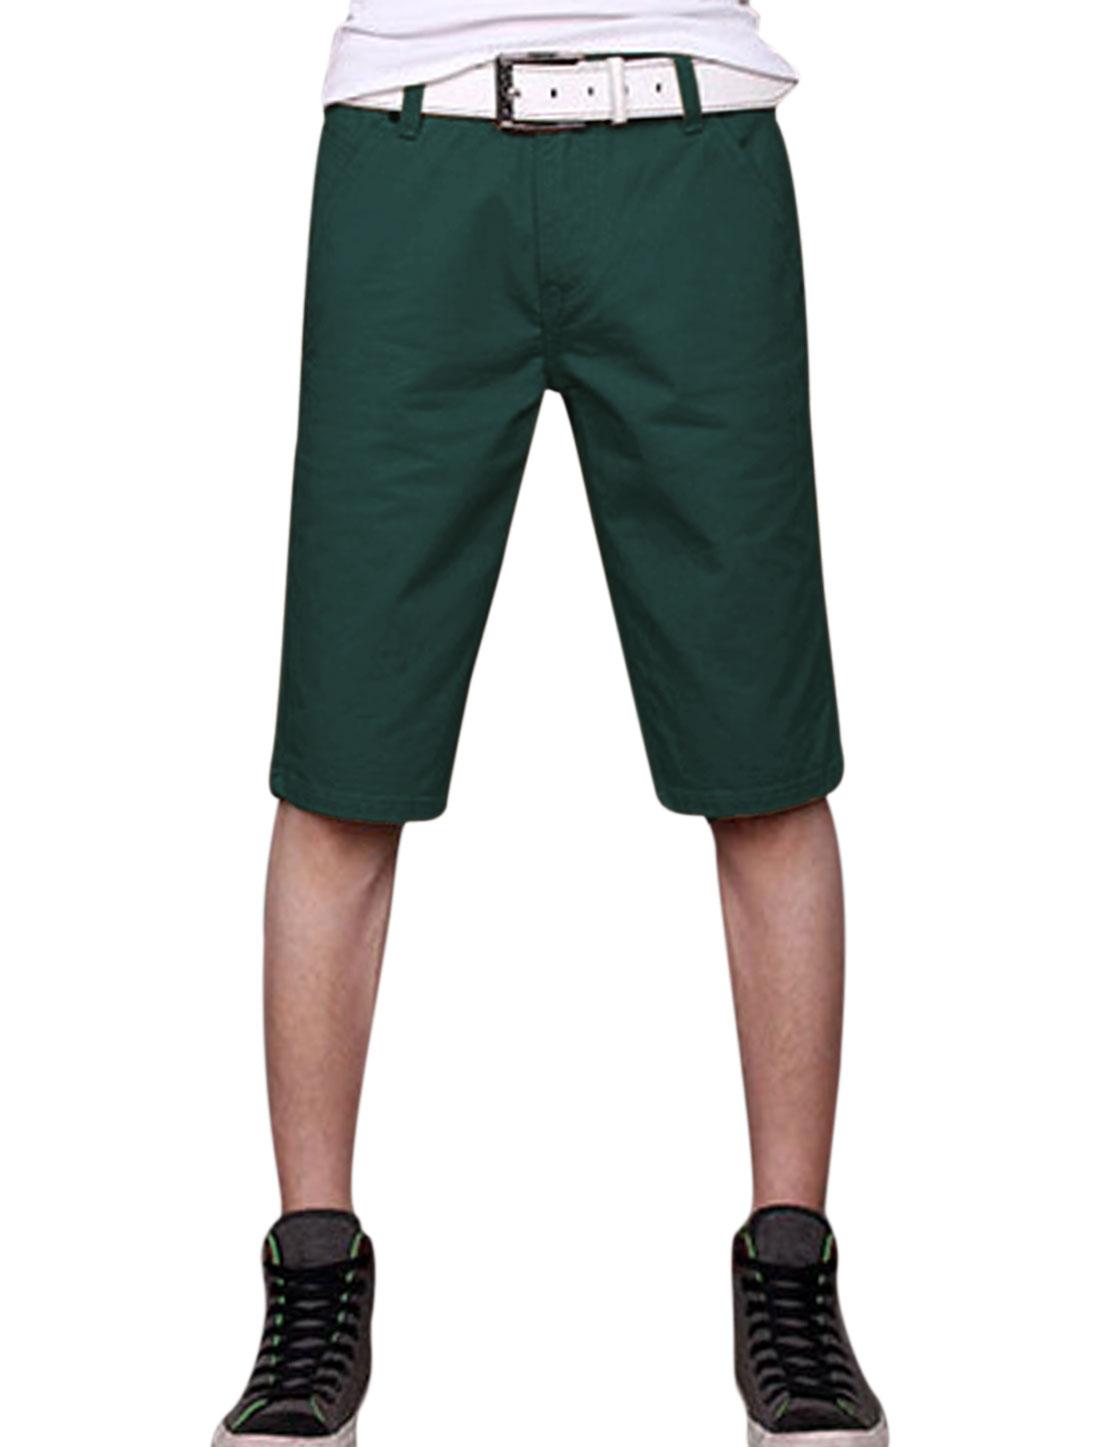 Man's Mid Rise Zip Fly Front Pockets Belt Loop Denim Shorts Dark Turquoise W34